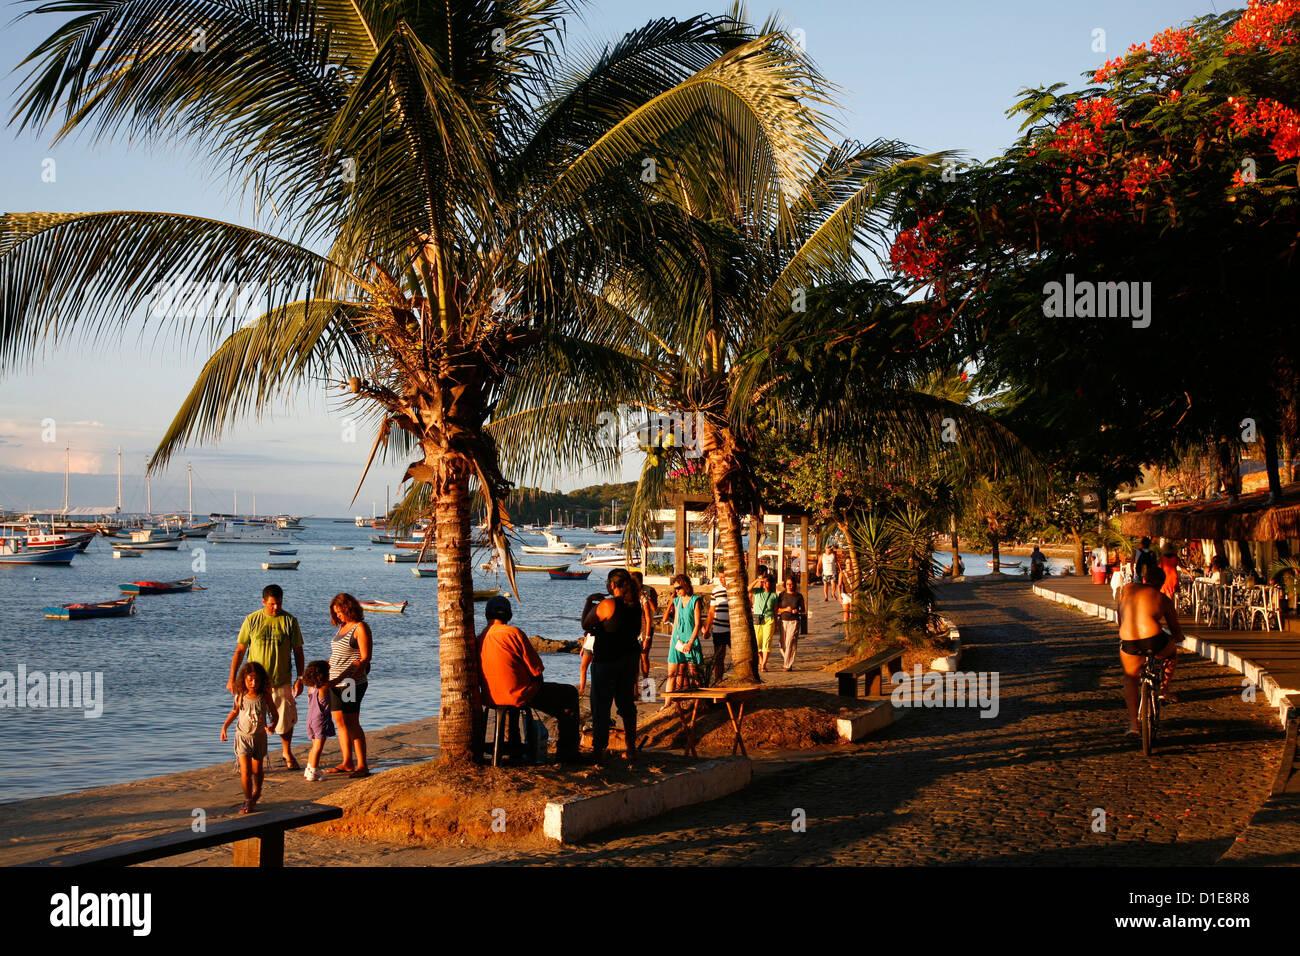 8472265d15ffb People walking on Orla Bardot promenade, Buzios, Rio de Janeiro State,  Brazil, South America